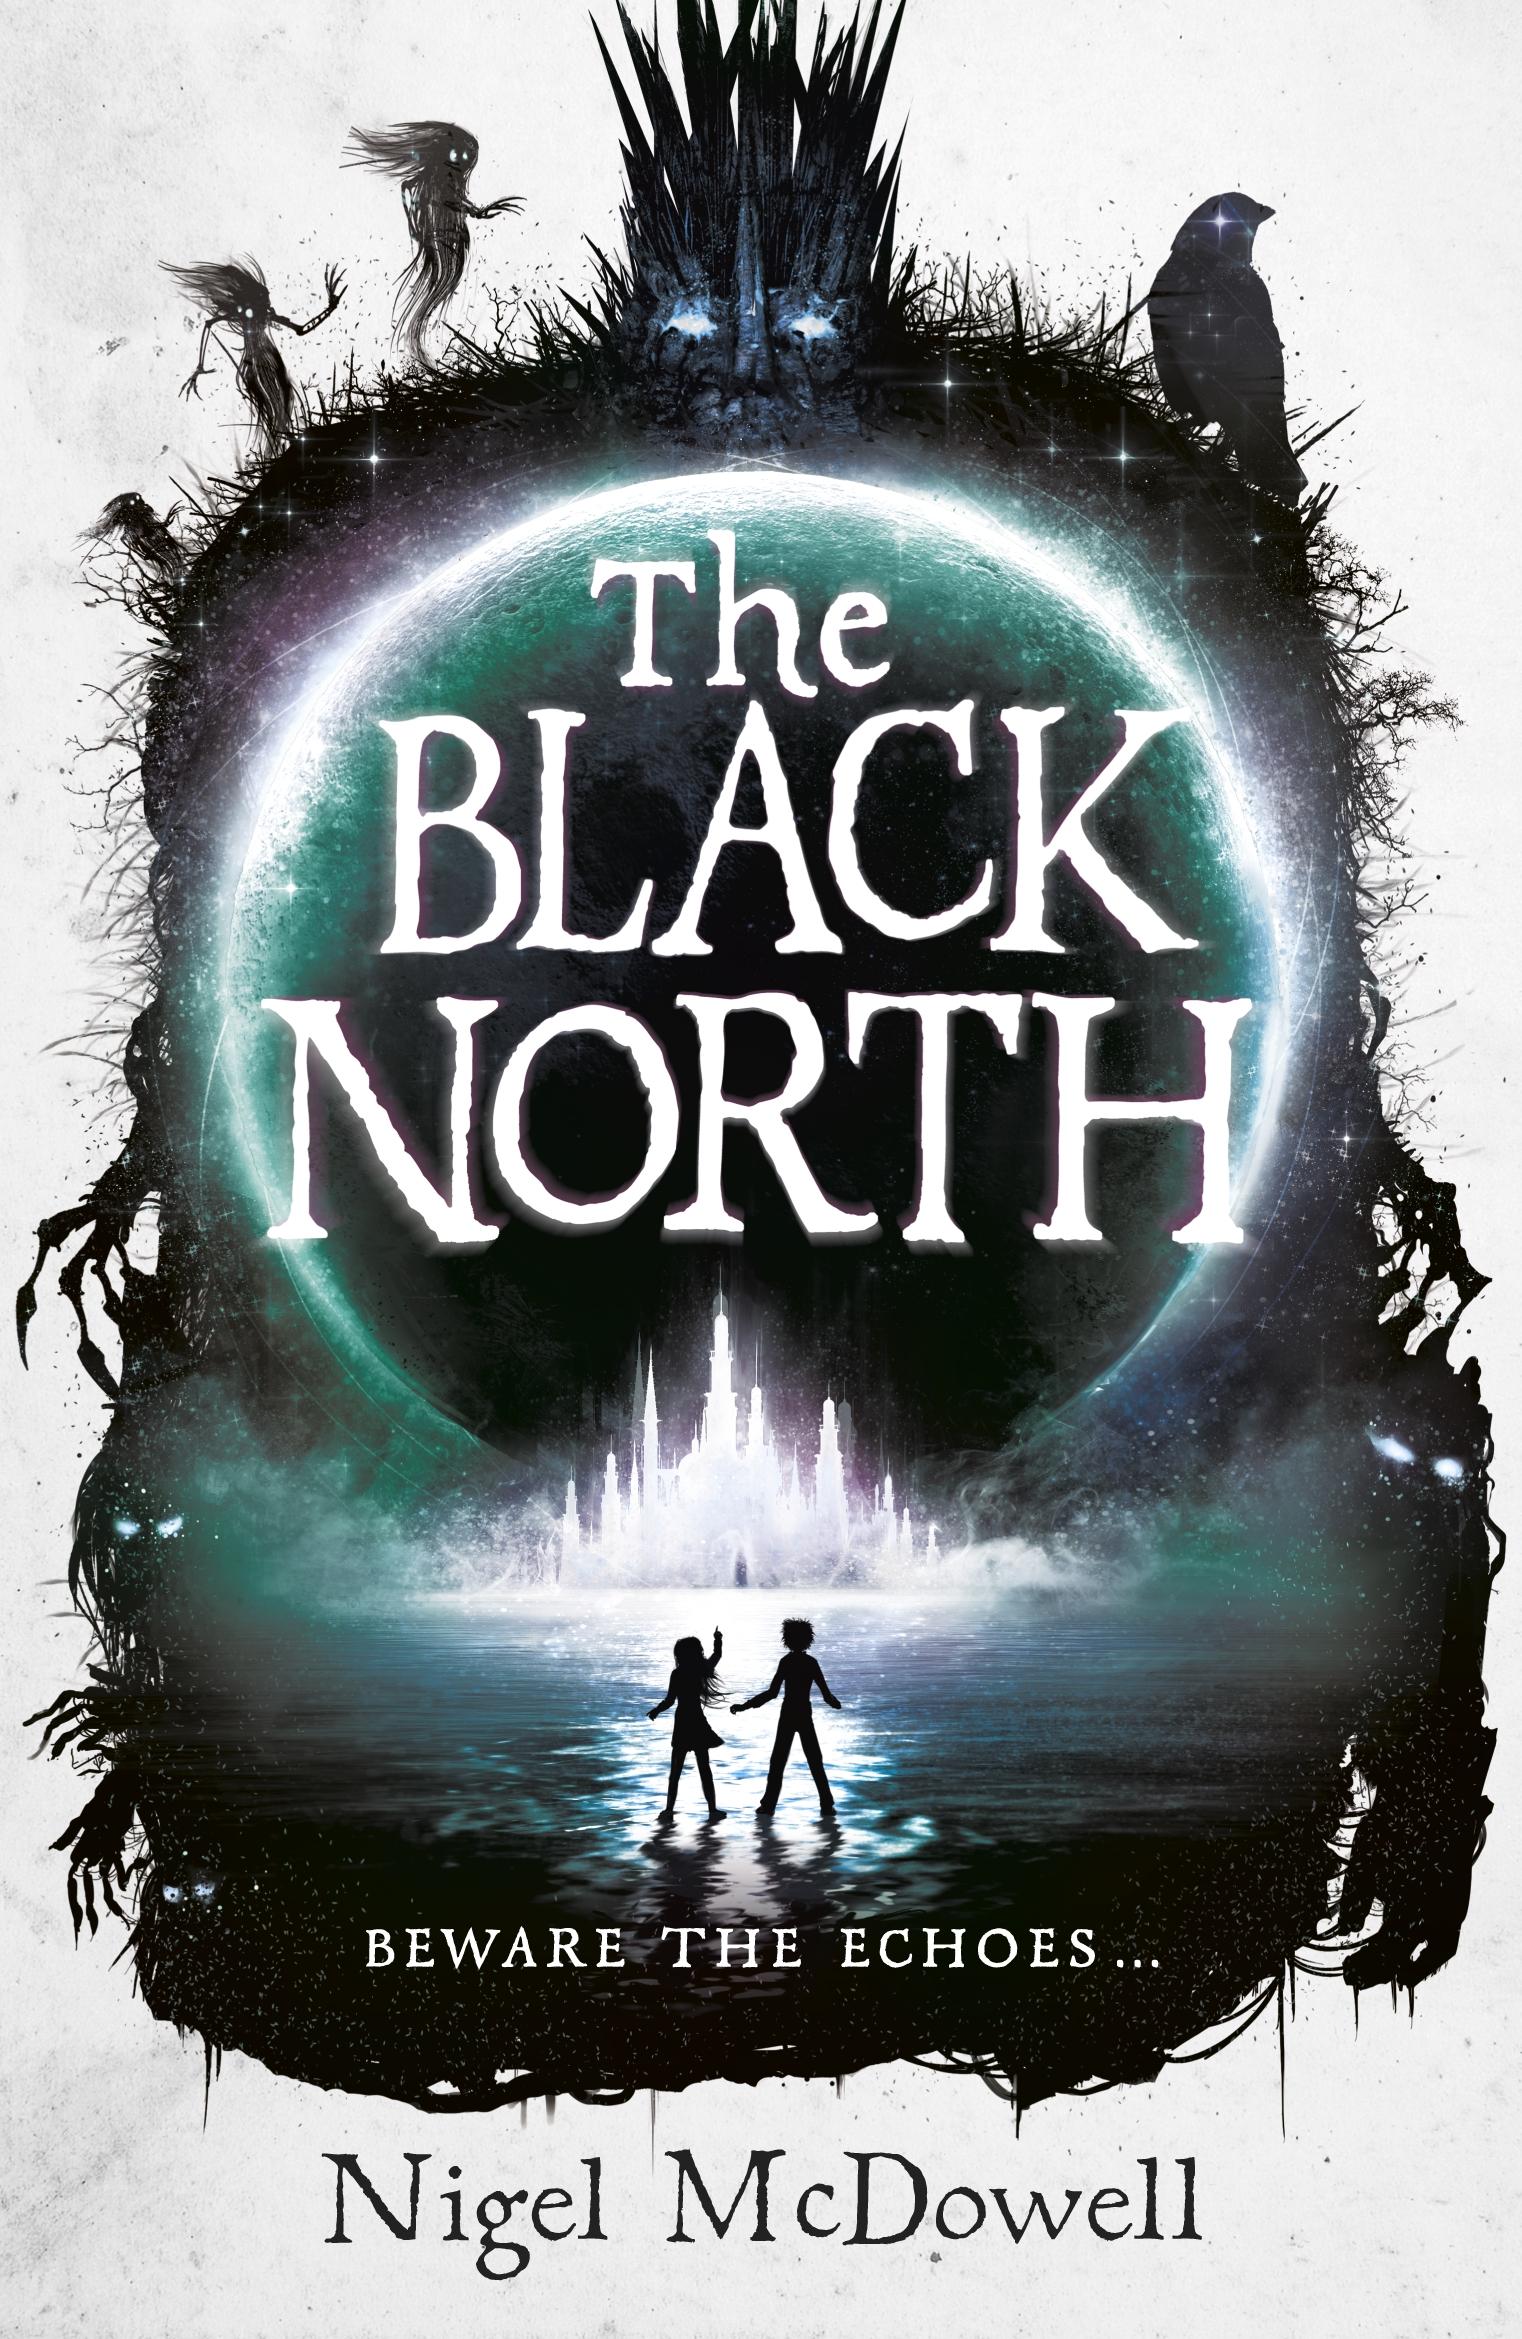 The Black North by Nigel McDowell